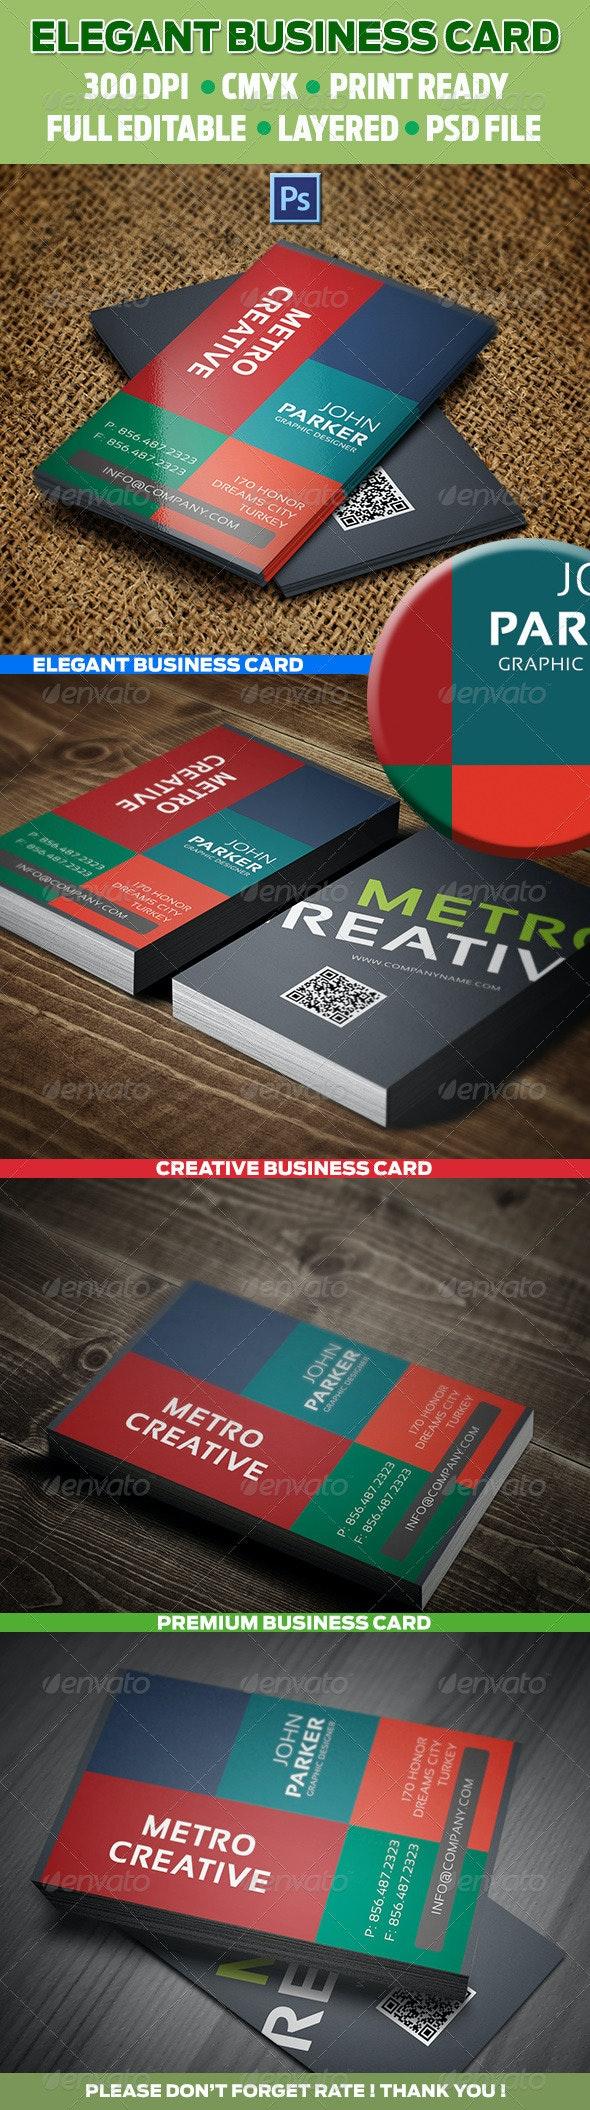 Creative Business Cards 18 - Creative Business Cards